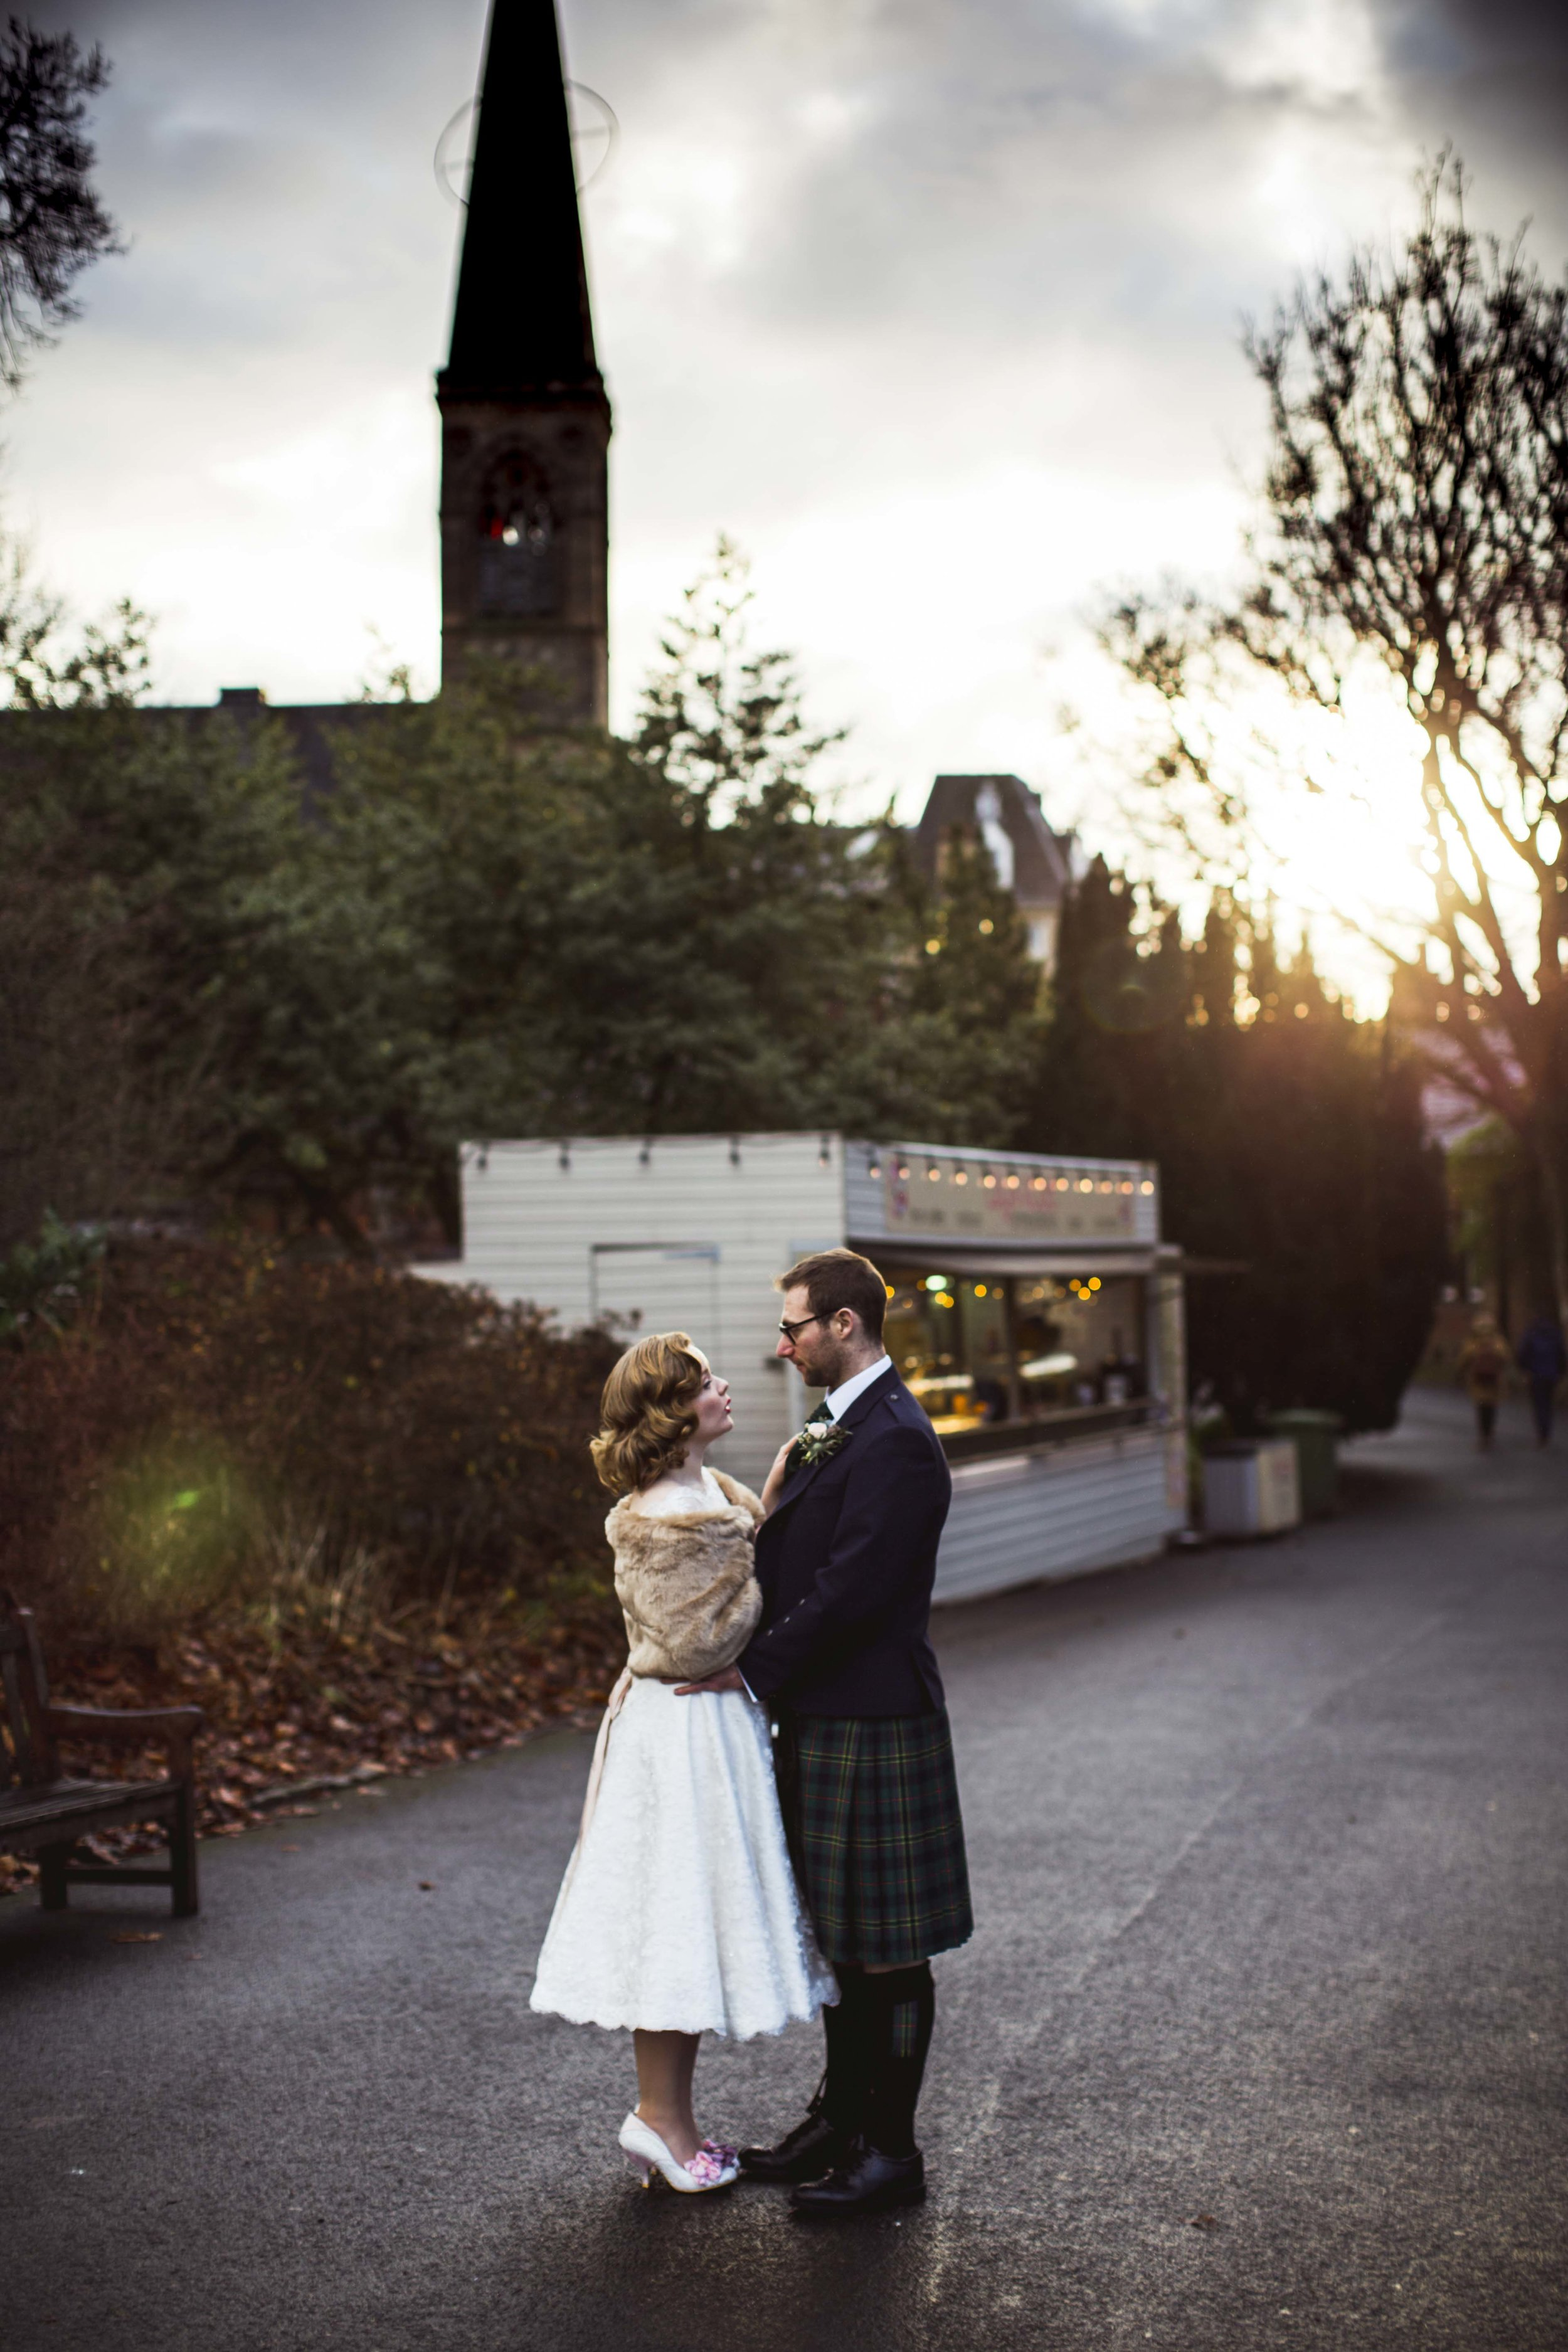 Sophie & Graeme Wedding Nov 2018  199  web.JPG